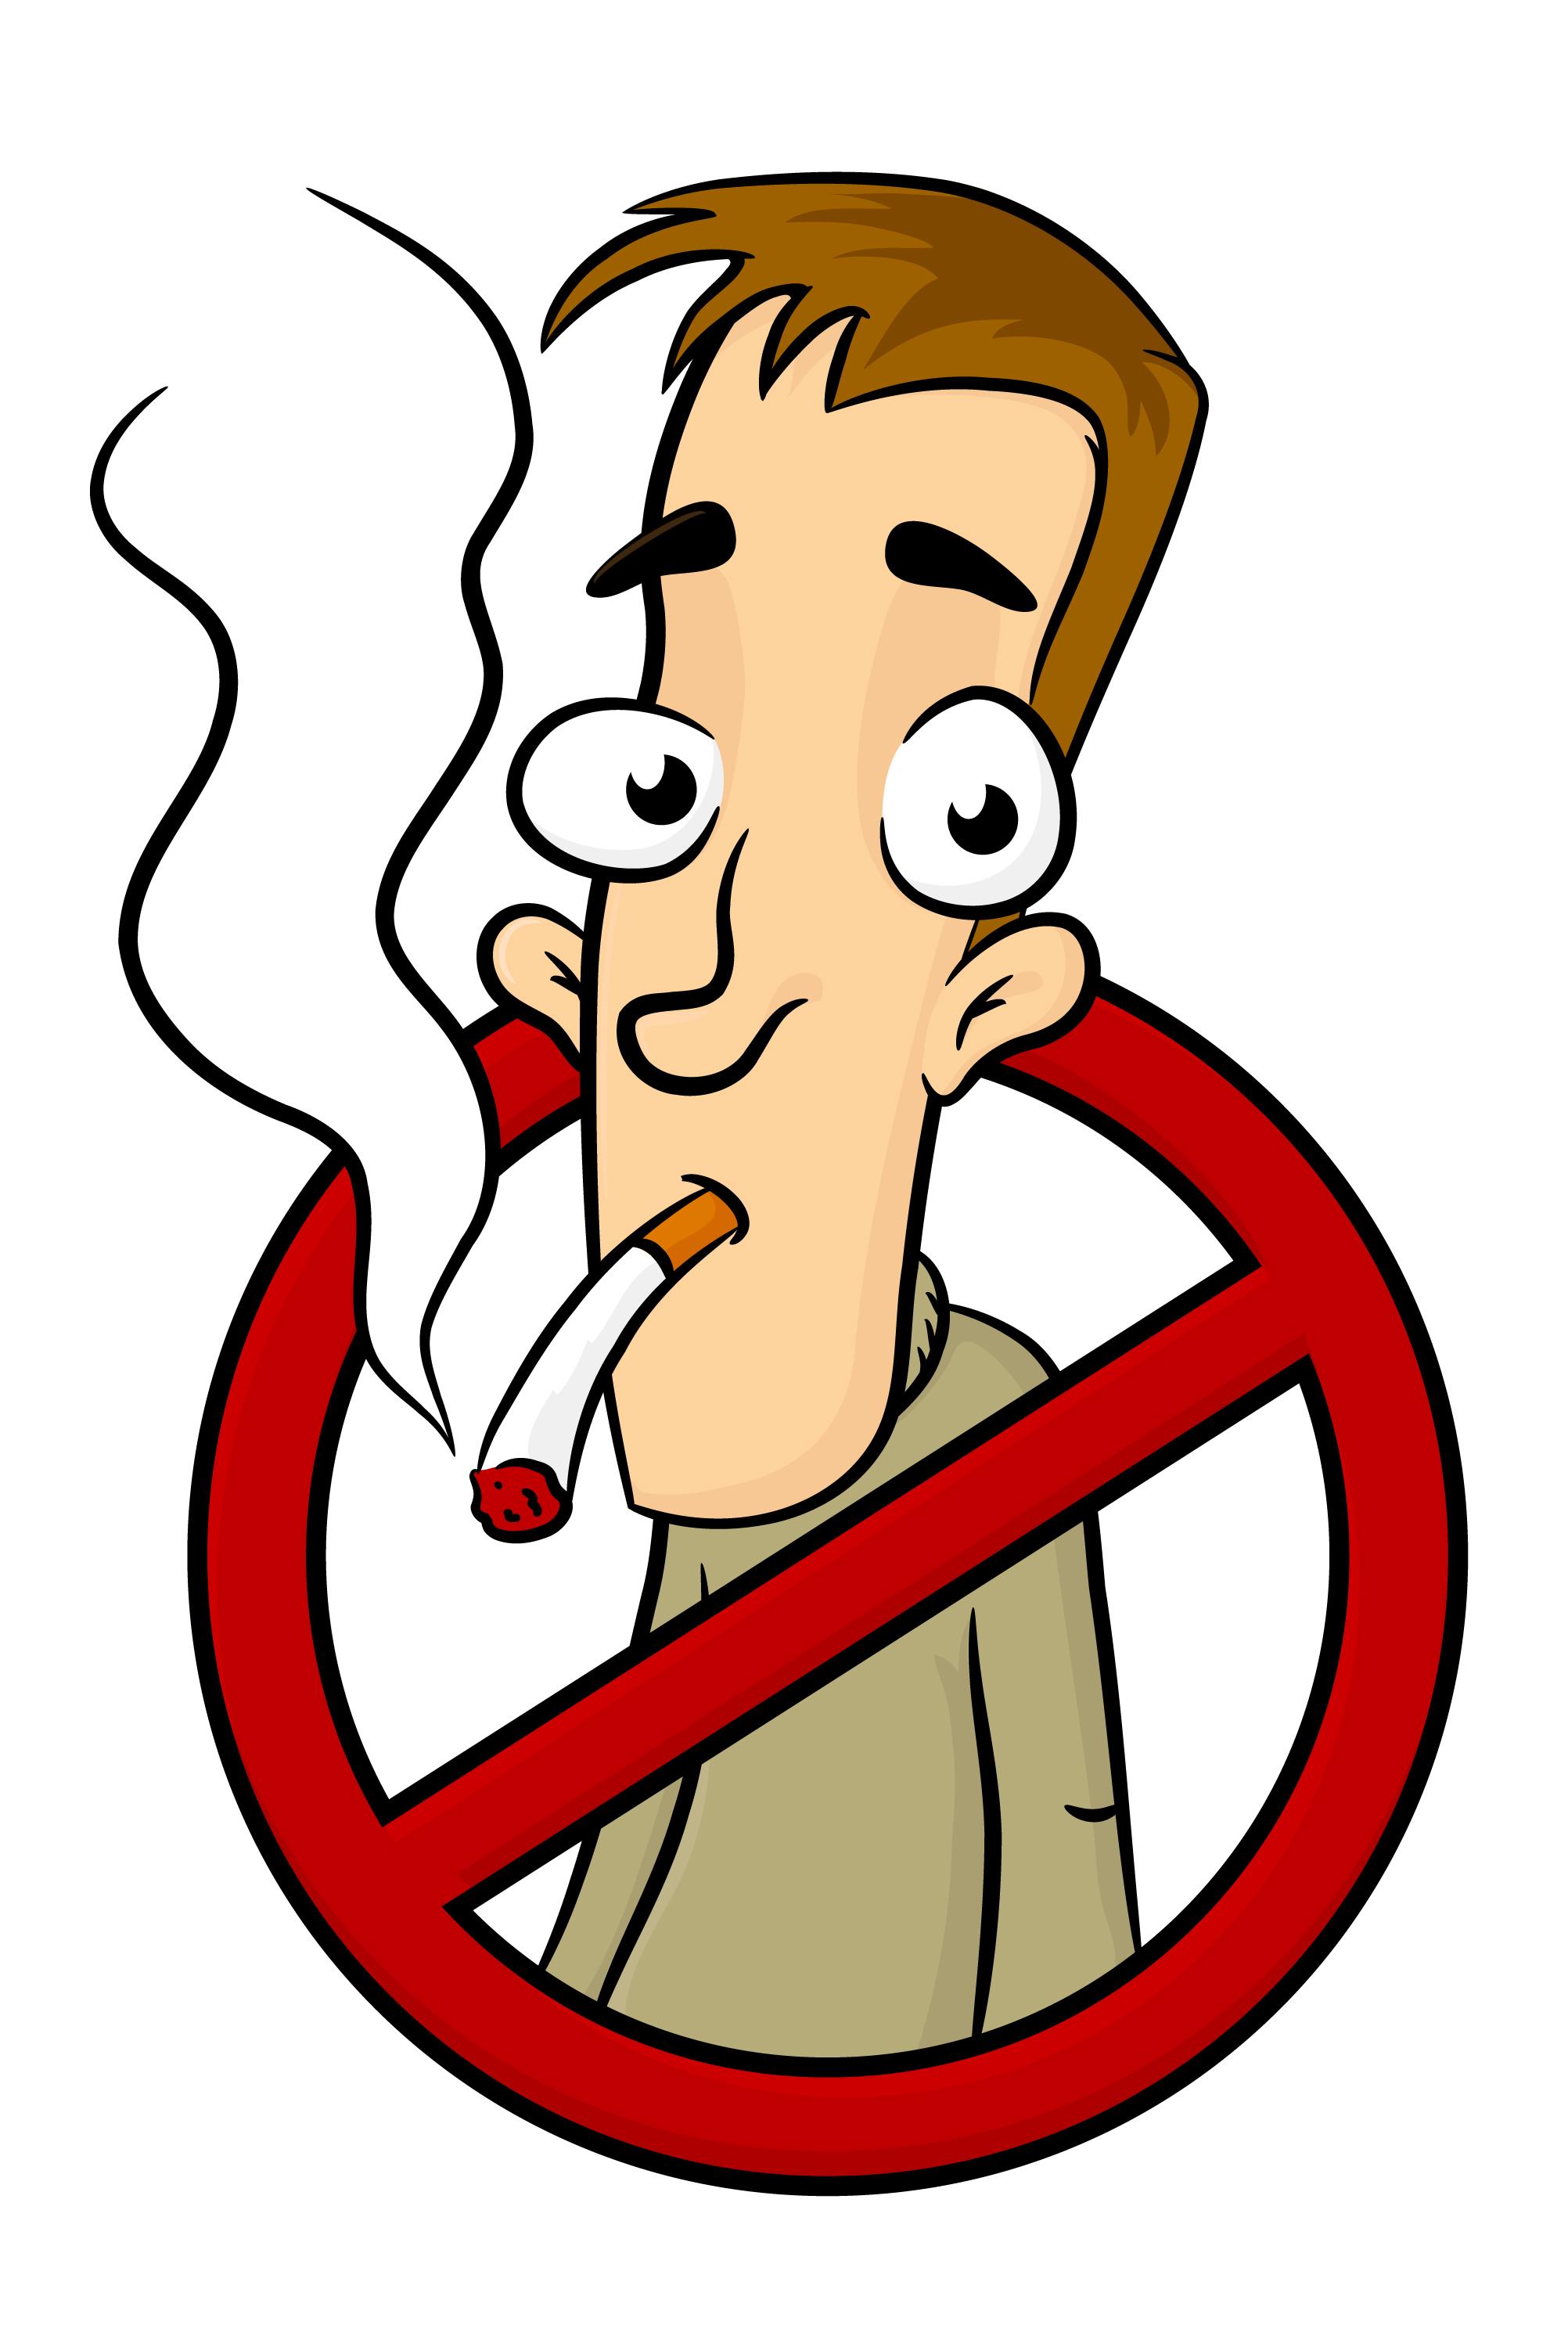 Smoking clipart healthy person, Smoking healthy person.